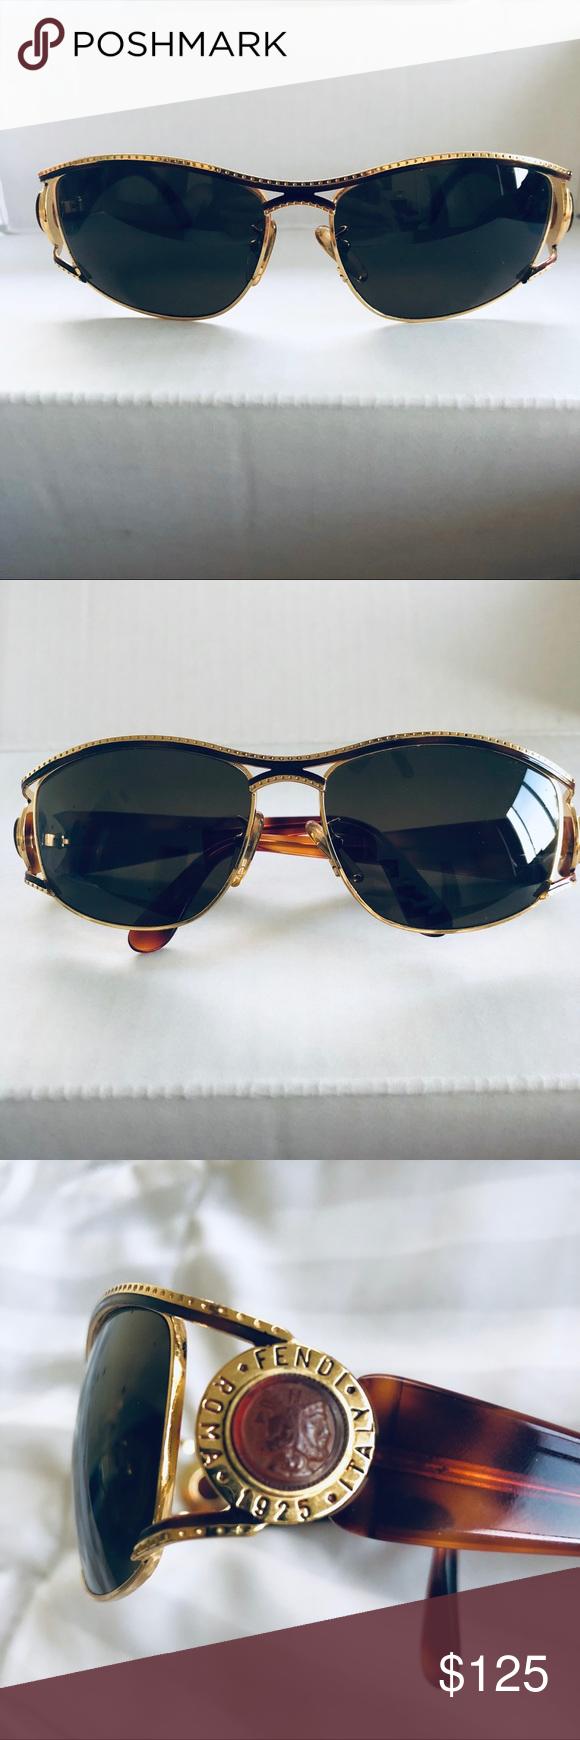 cfaf4a7eecb Fendi vintage sunglasses beautiful brown and gold vintage fendi sunglasses  like new but png 580x1740 Accessories